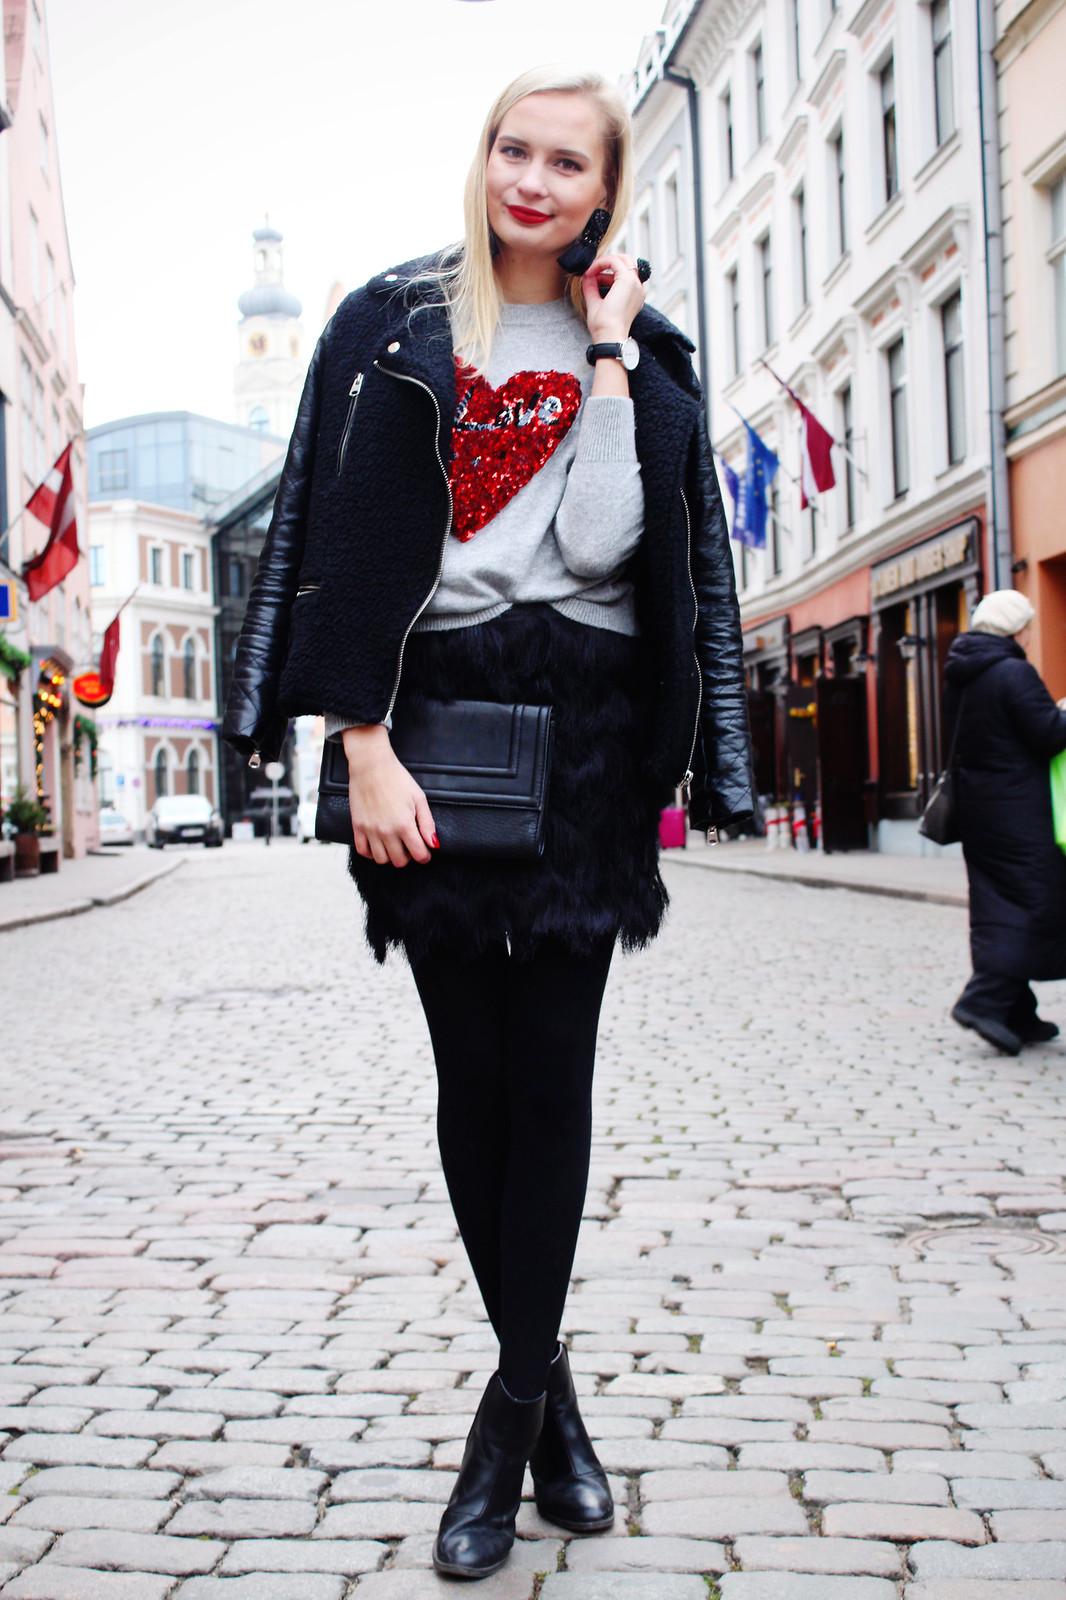 H&M and fashion blogger collaboration